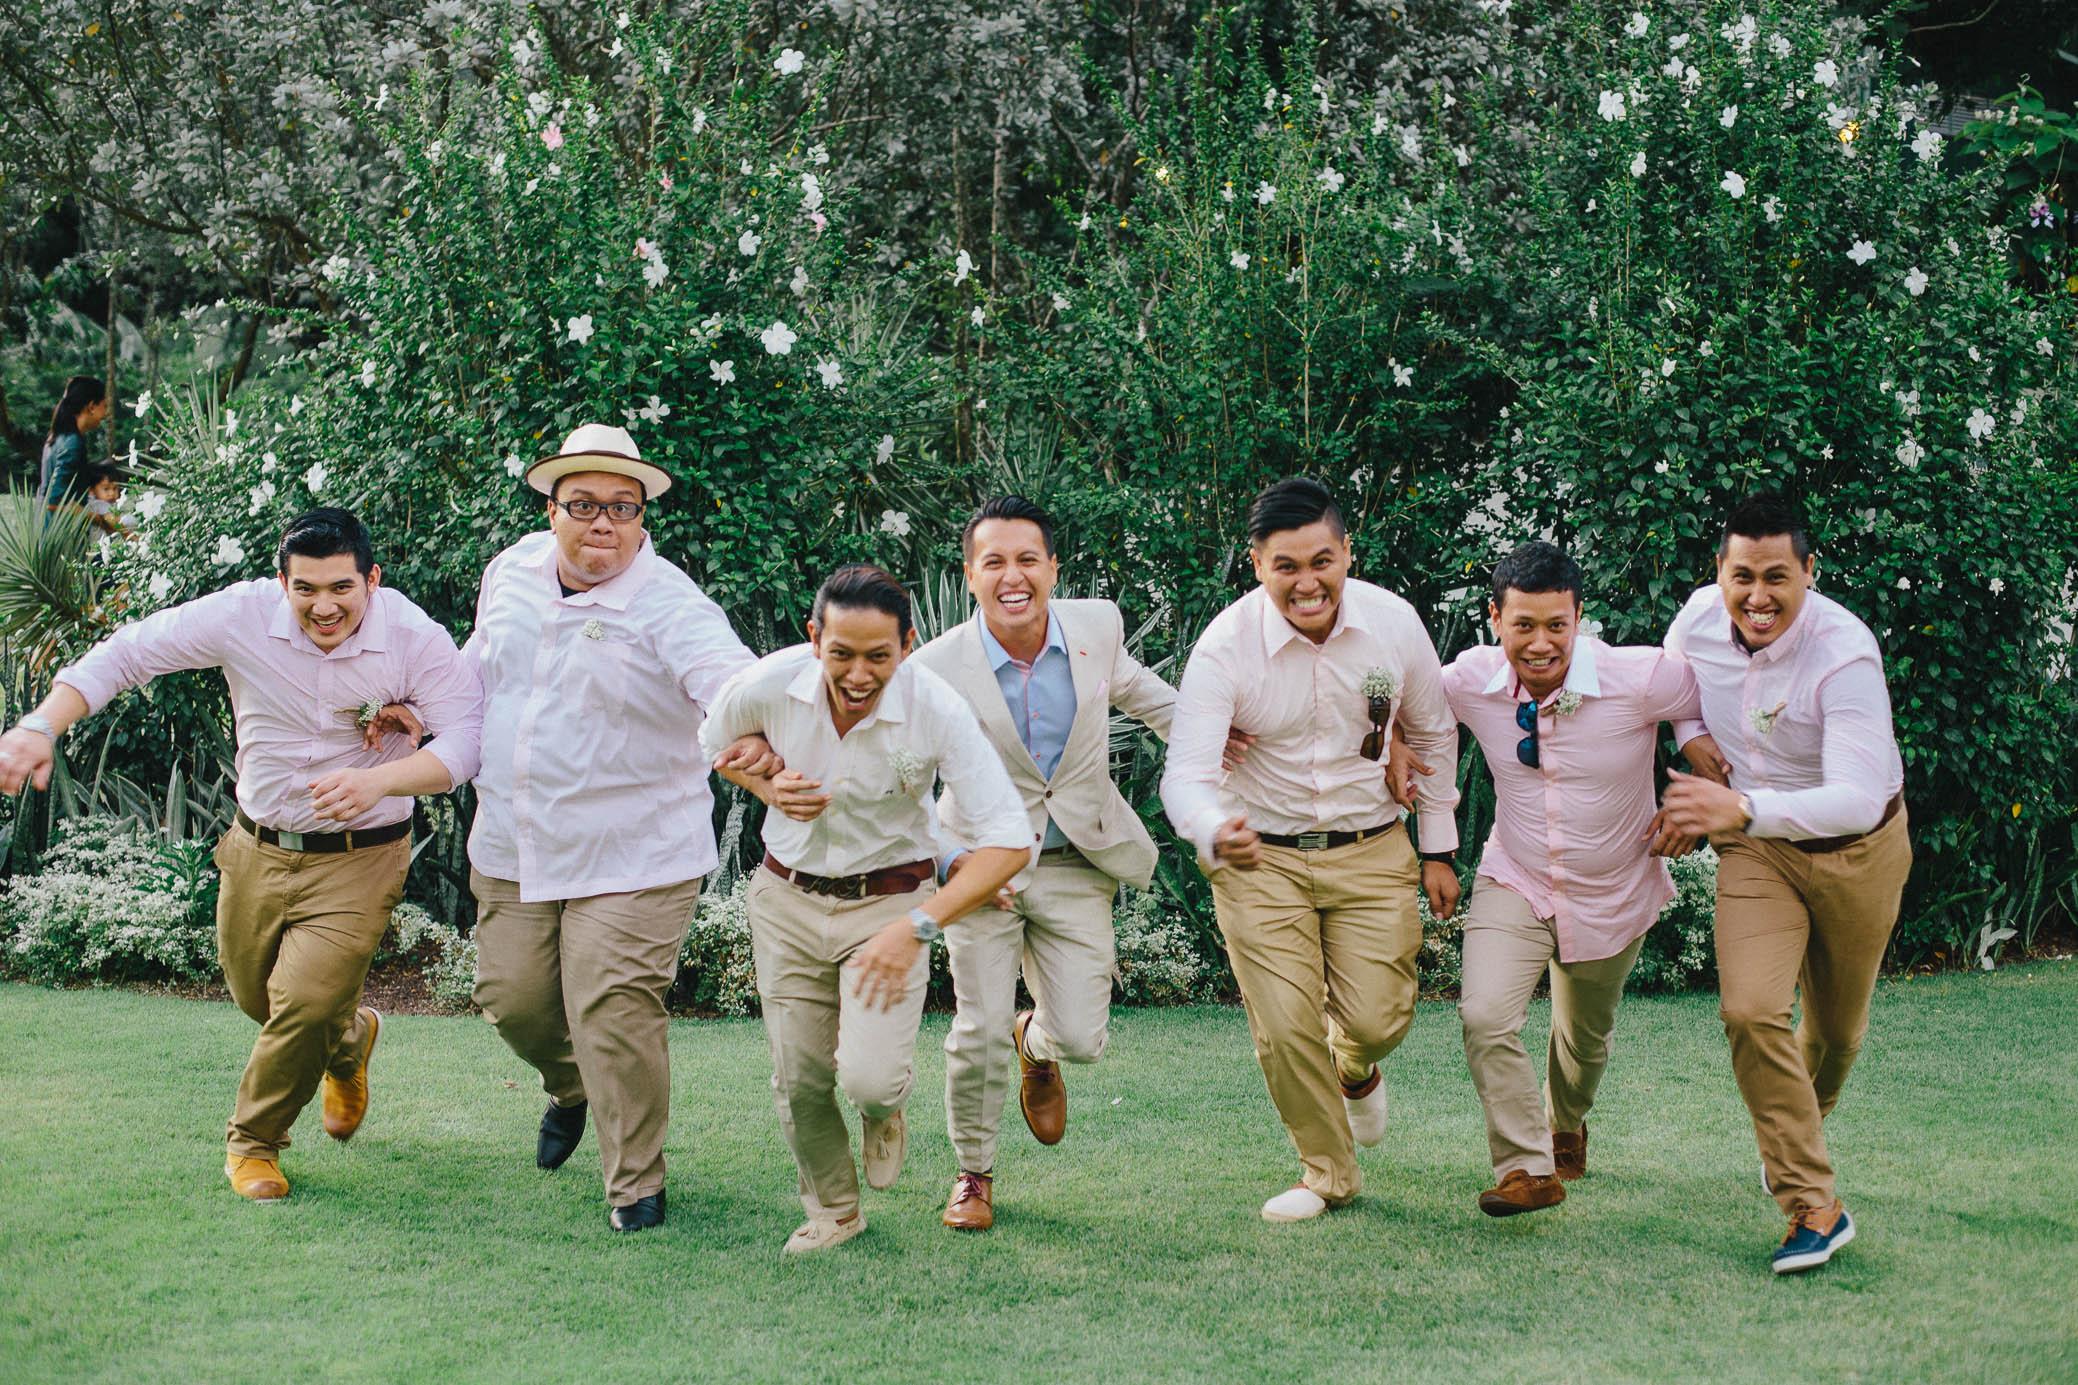 singapore-wedding-photographer-malay-indian-pre-wedding-travel-wmt-2015-alif-ethel-58.jpg